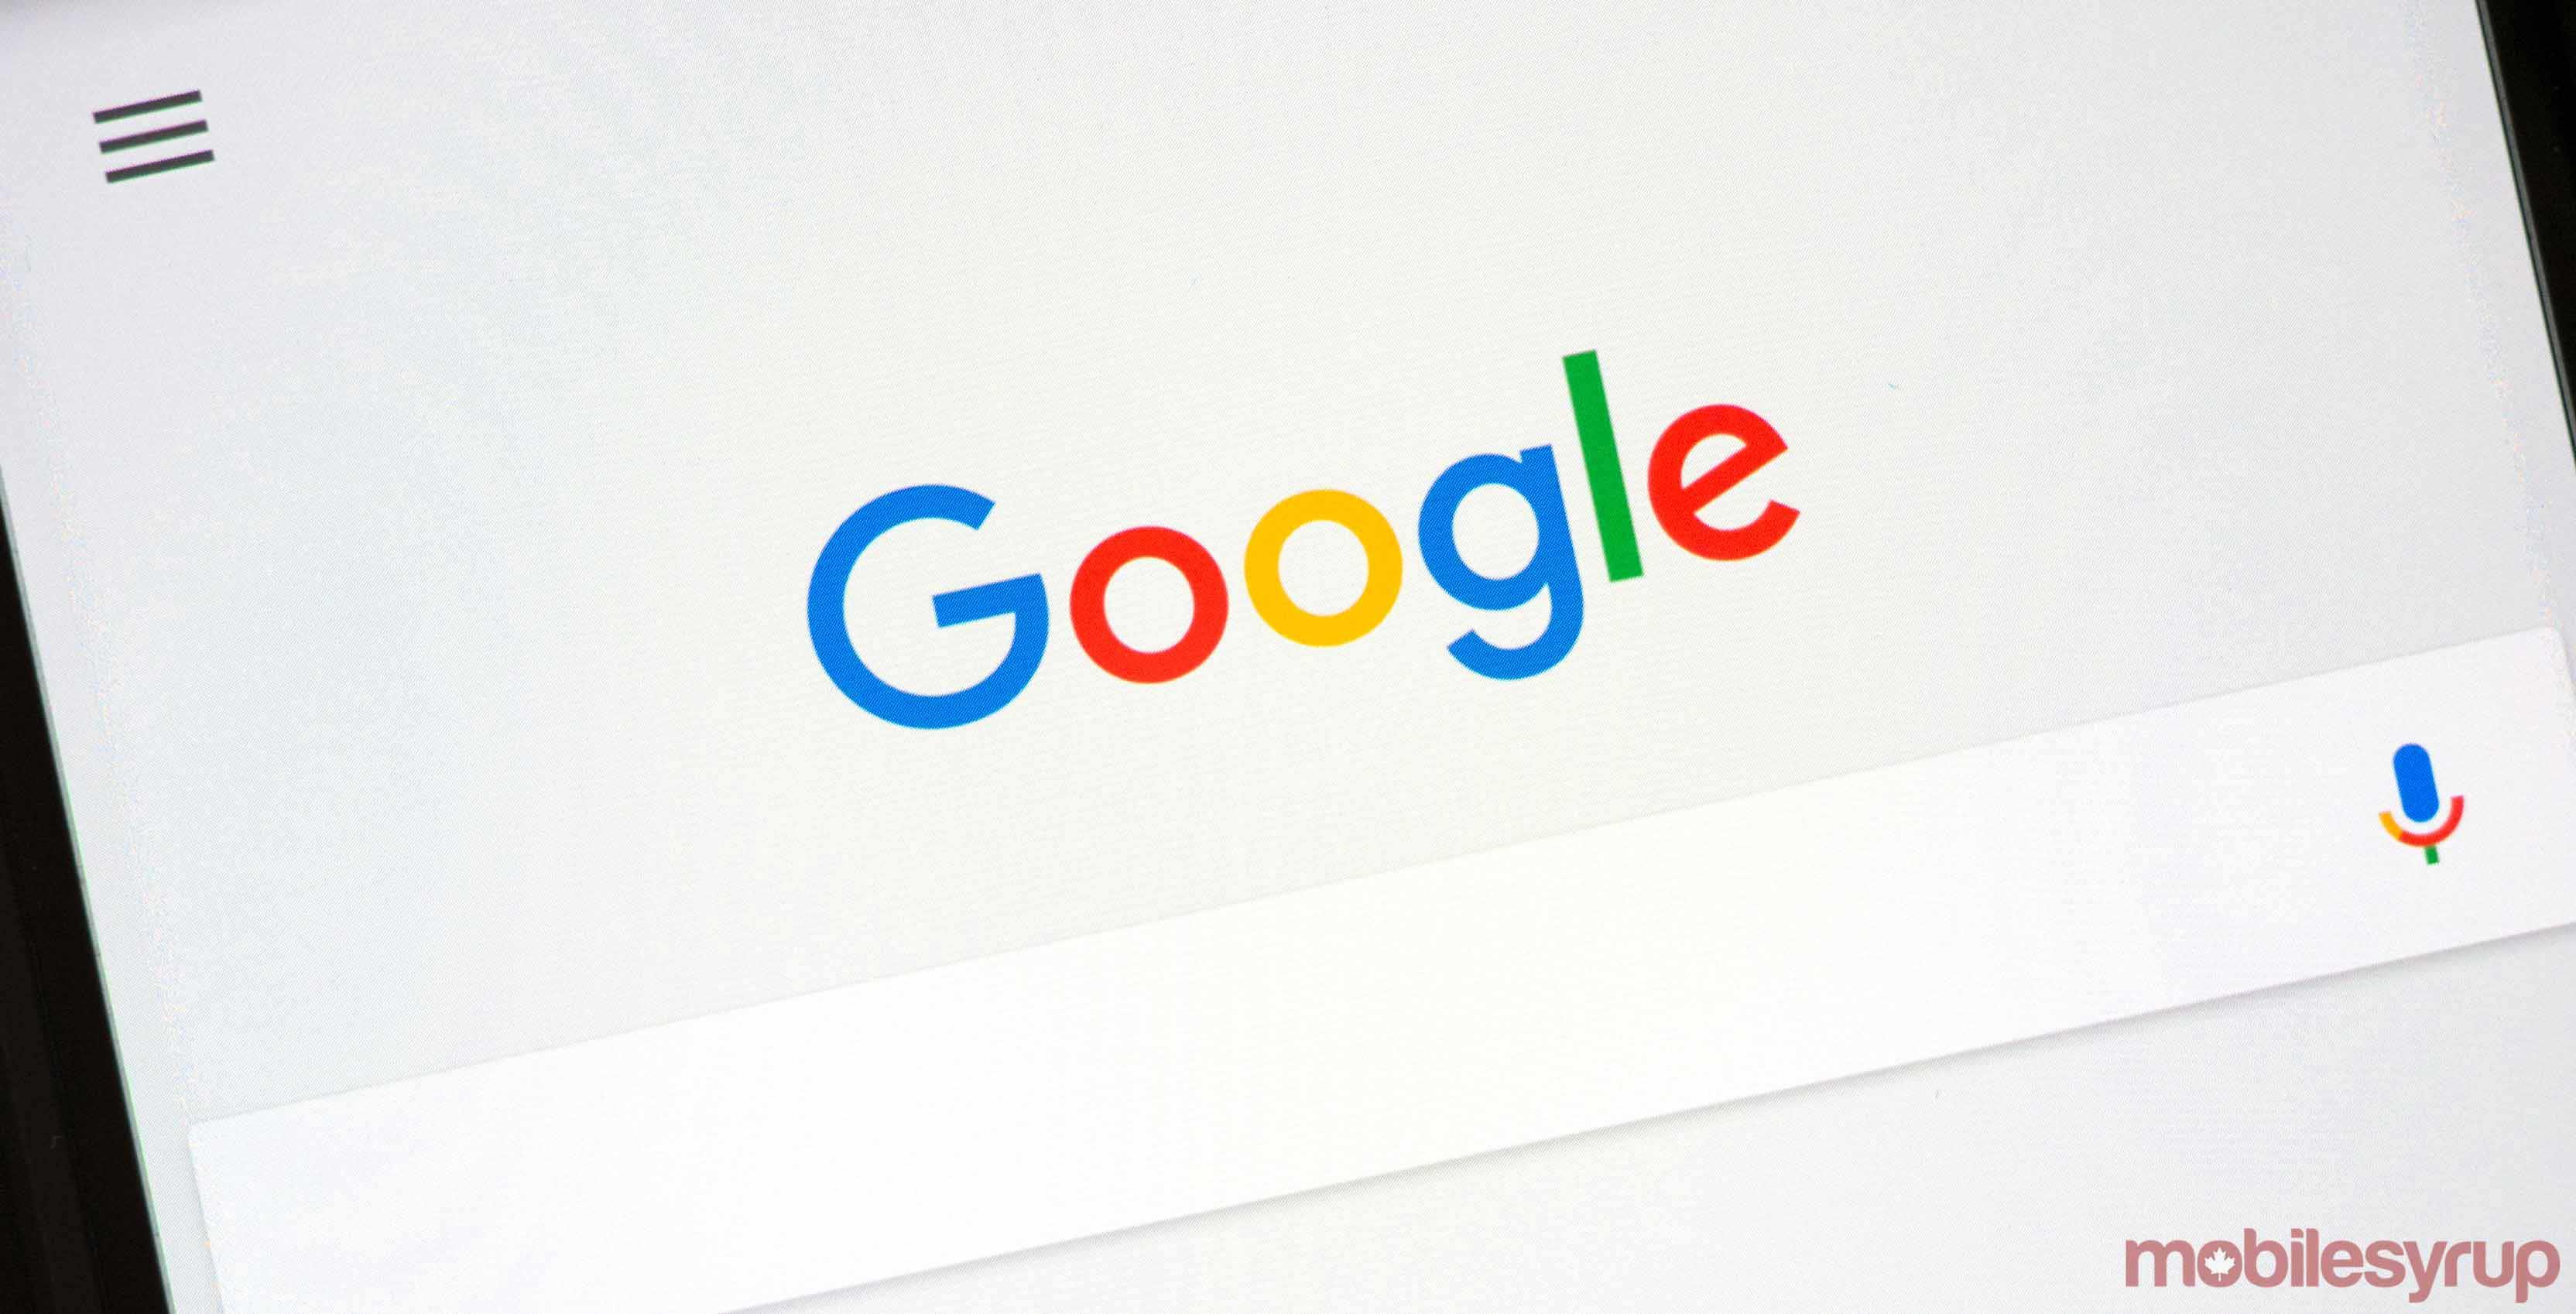 Google Canada search bar